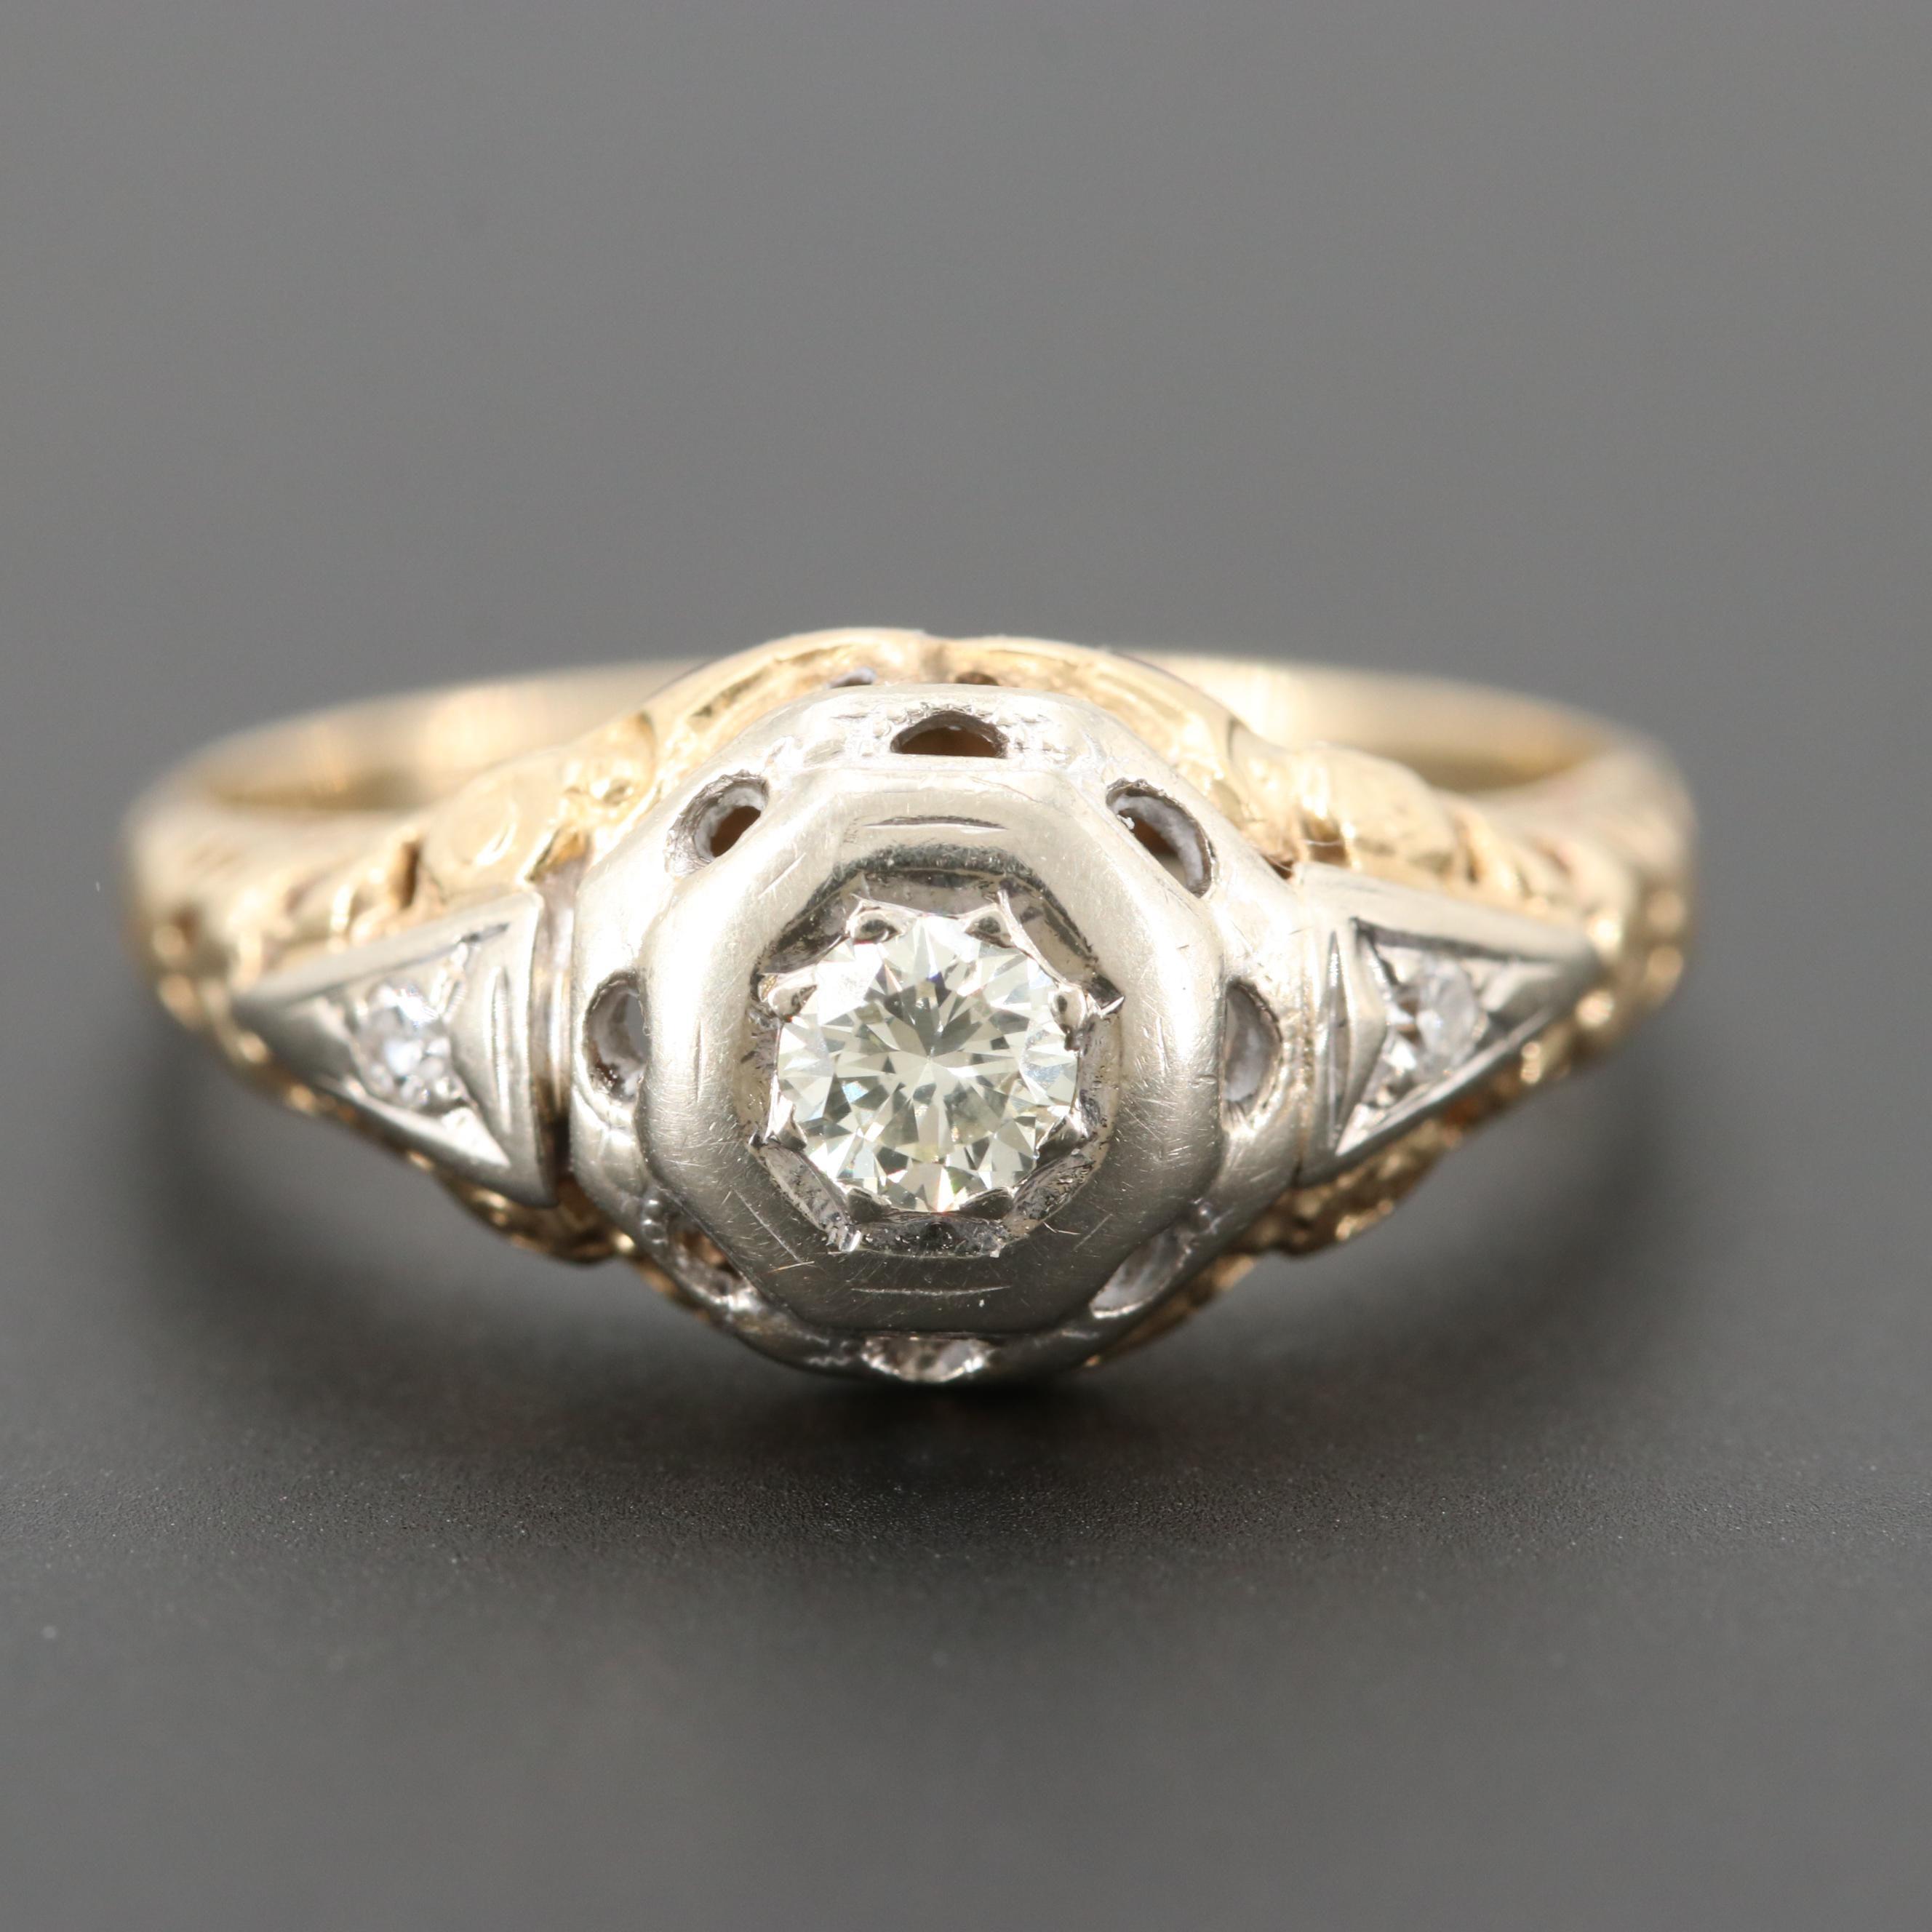 Circa 1930 14K White and Yellow Gold Diamond Ring